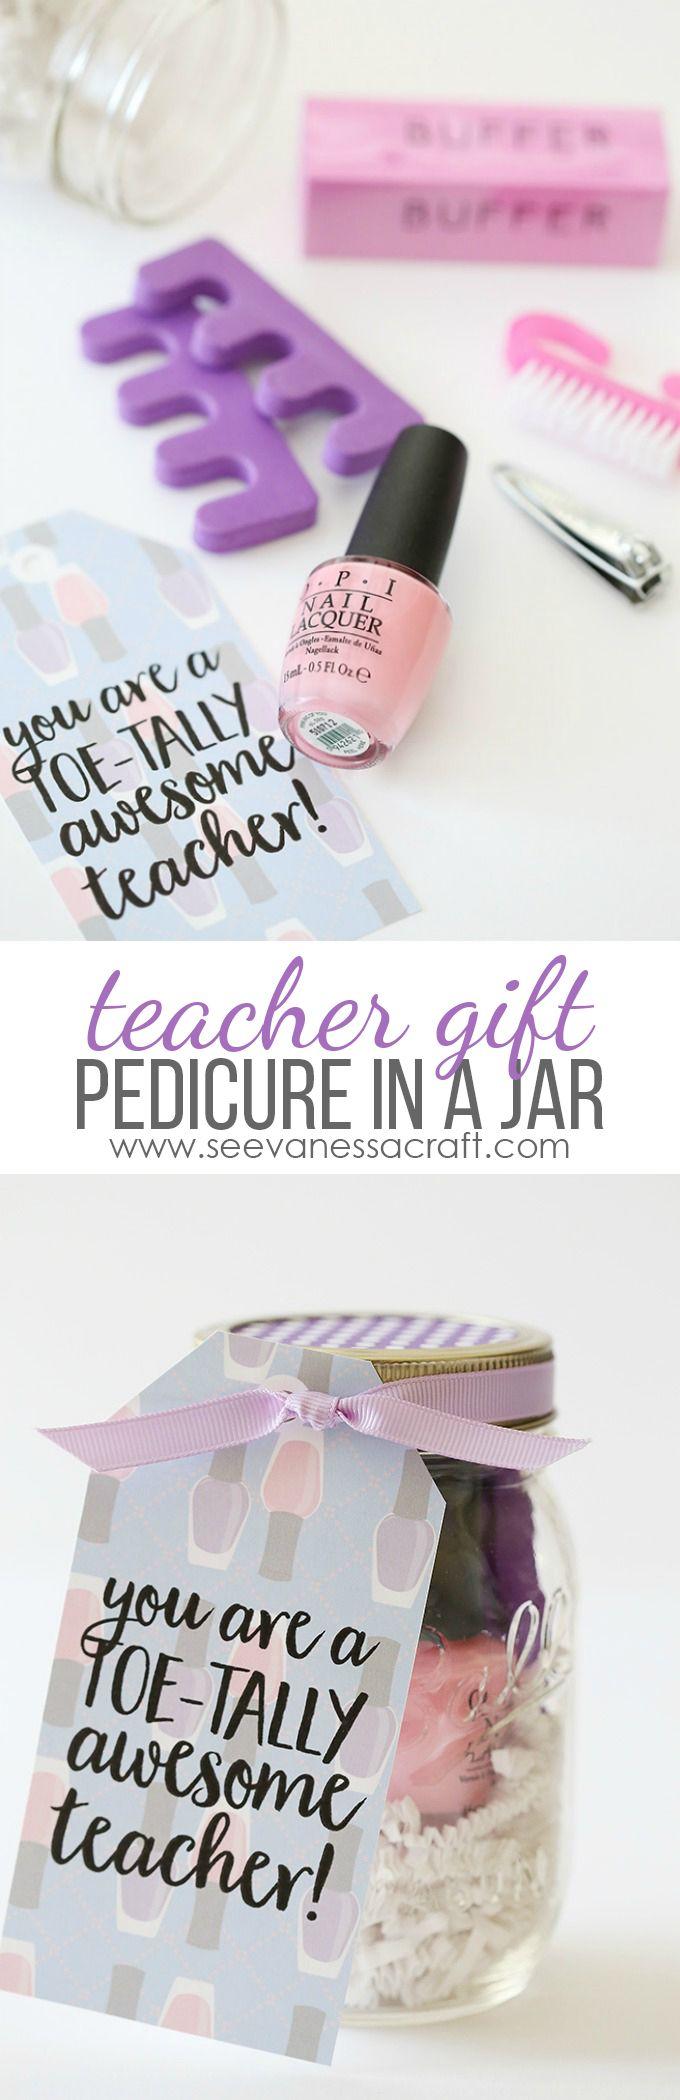 Pedicure in a Jar Teacher Appreciation Week Gift - Teacher or Friend Gift Idea with Free Printable Tags!